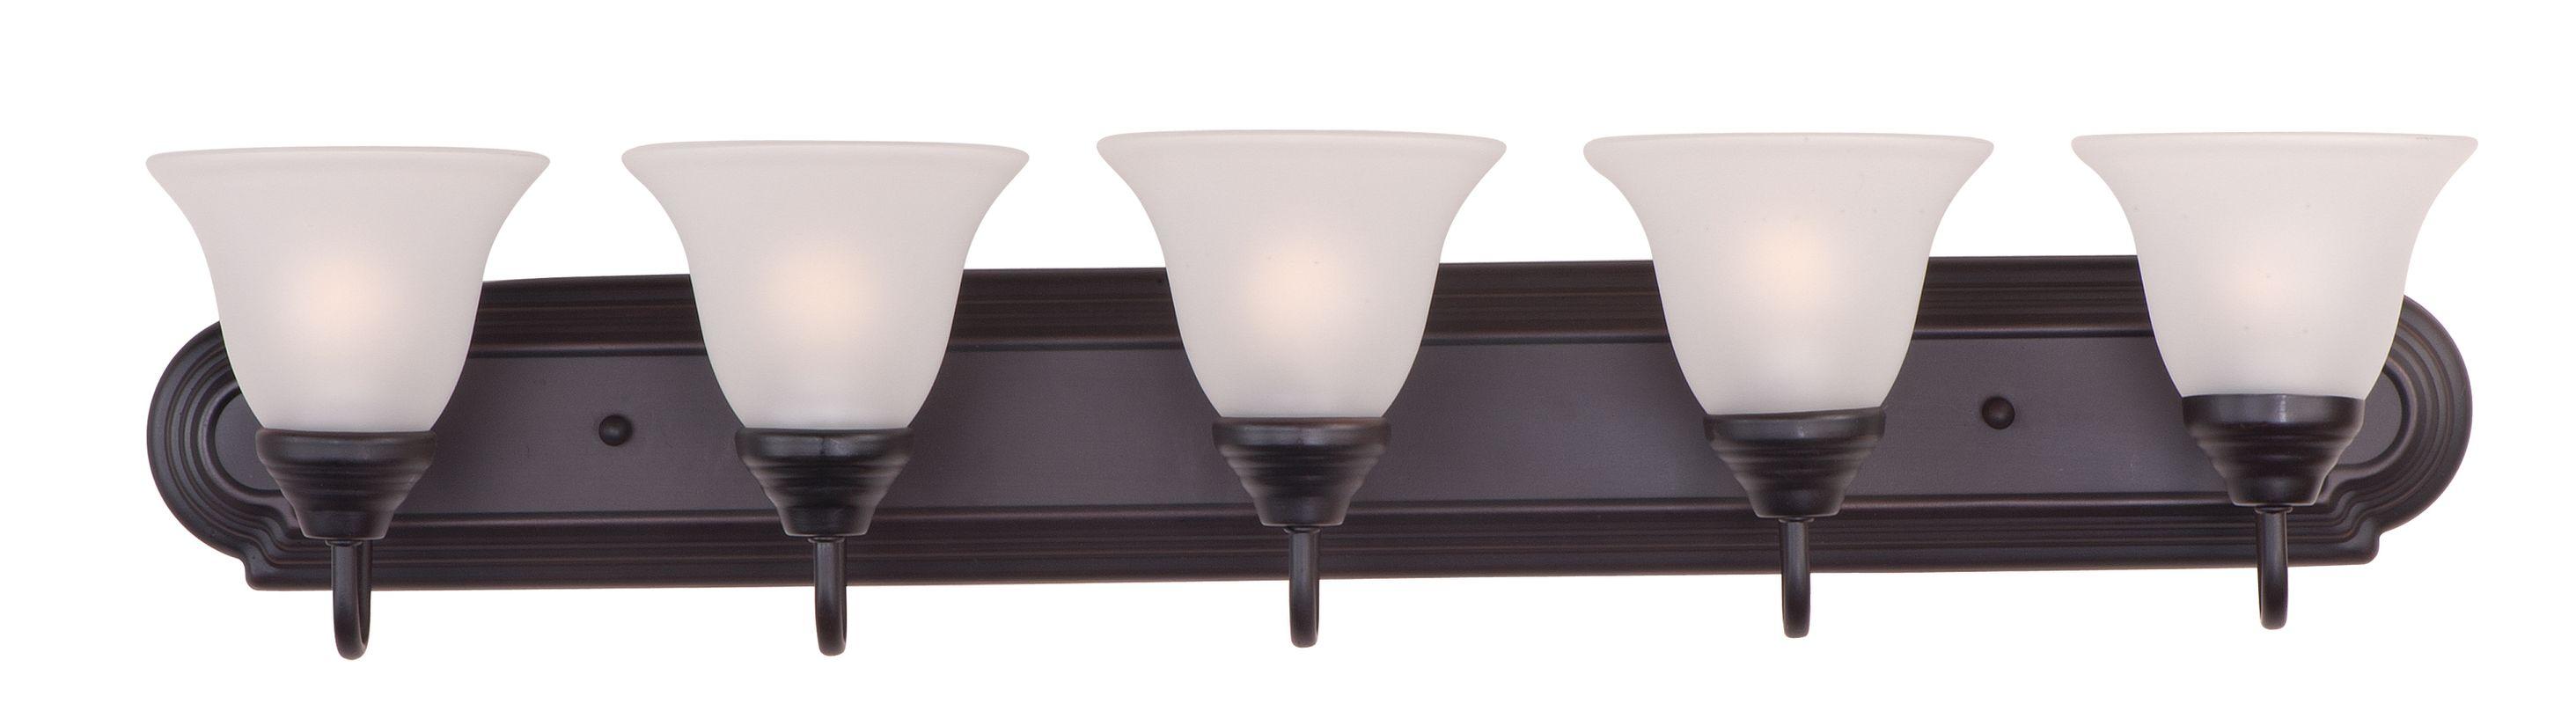 Maxim 8015ftoi Oil Rubbed Bronze Essentials 36 Wide 5 Bulb Bathroom Light Fixture